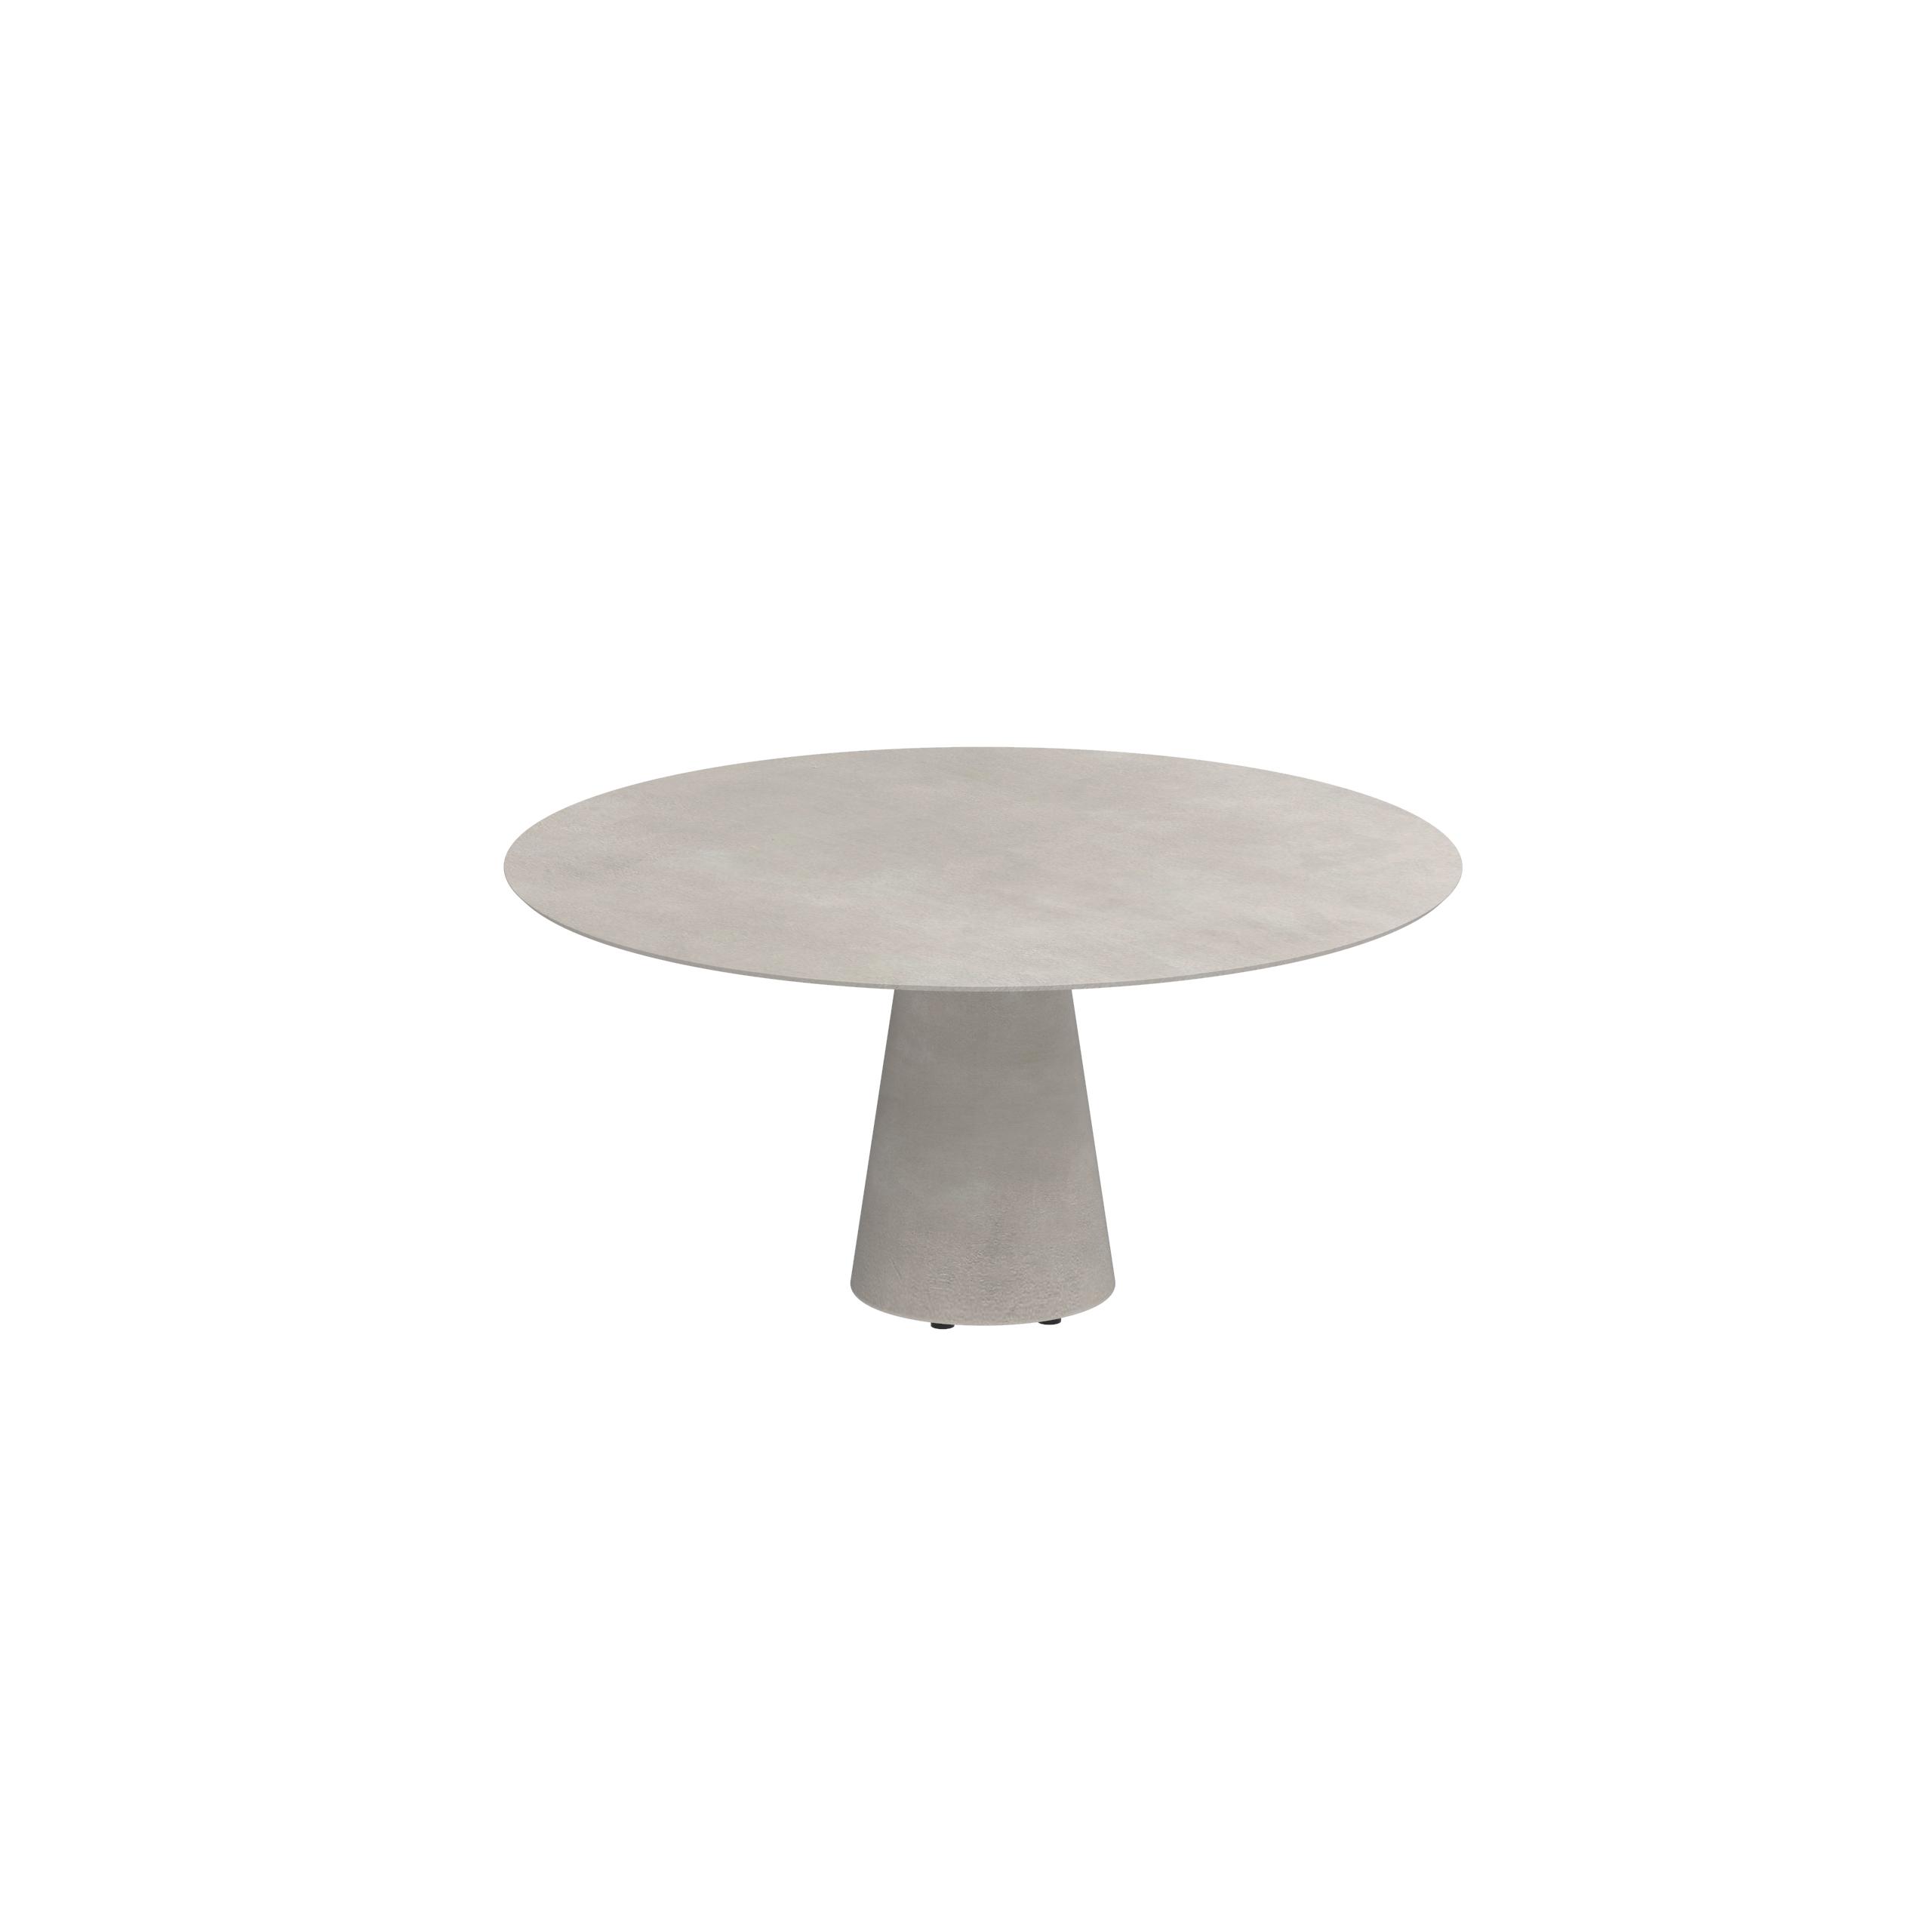 conix table 160cm round concrete